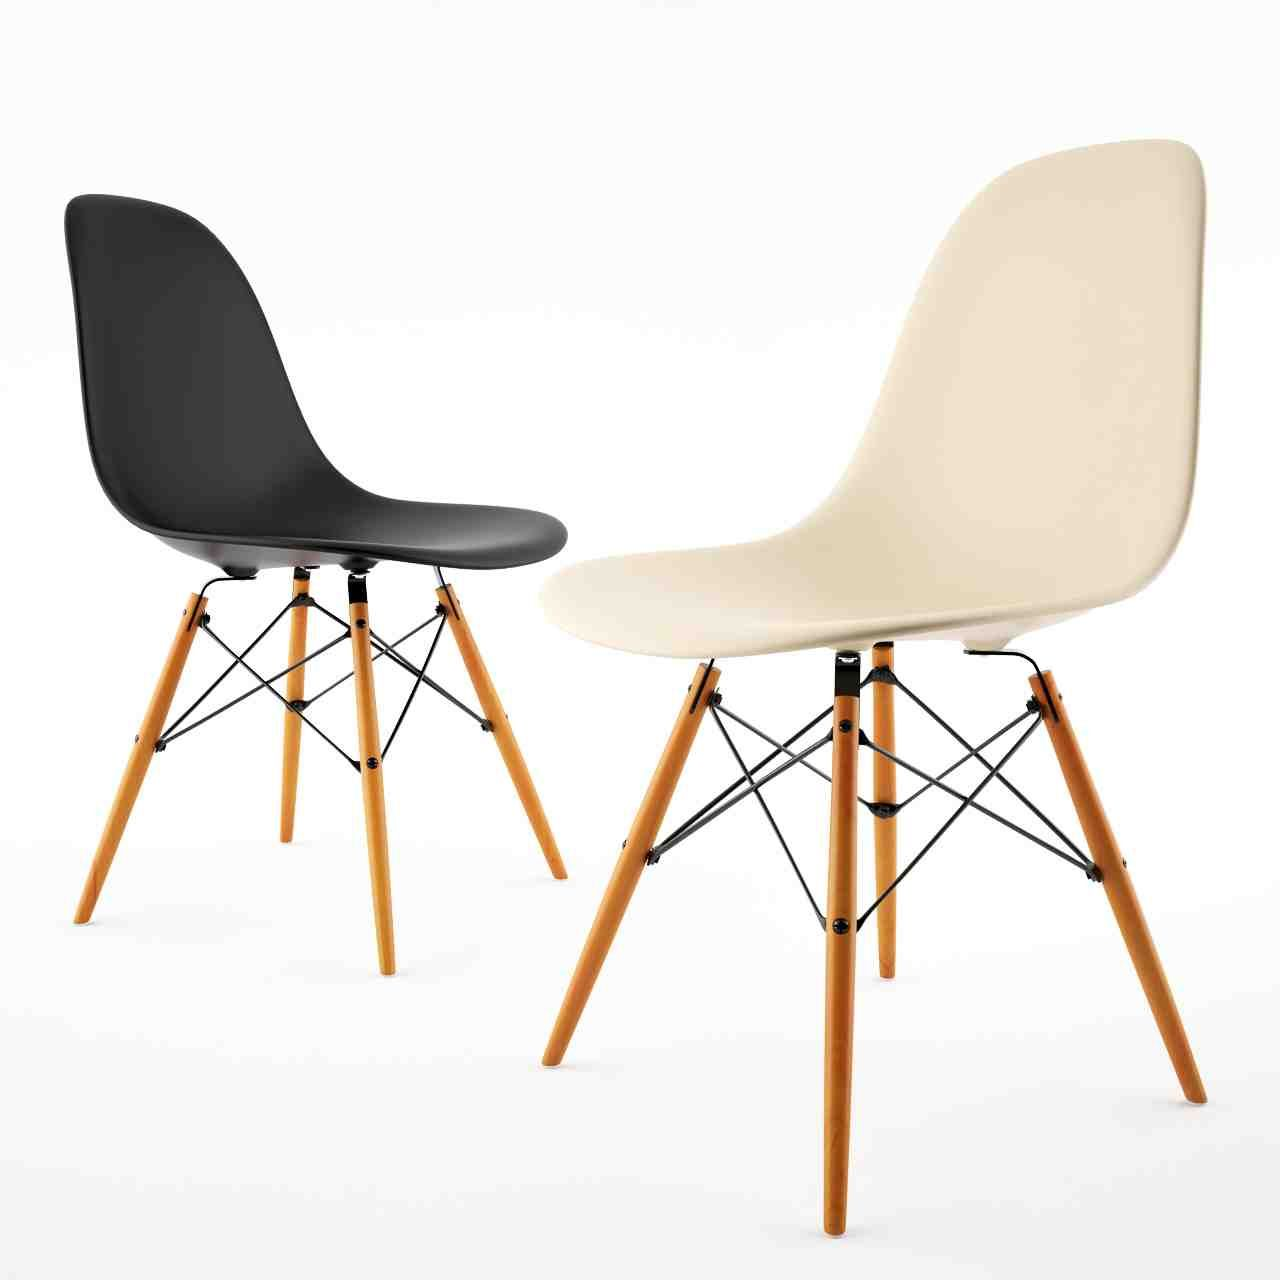 Vitra Eames Chair Eames Chair Vitra Eames Chairs Furniture Design